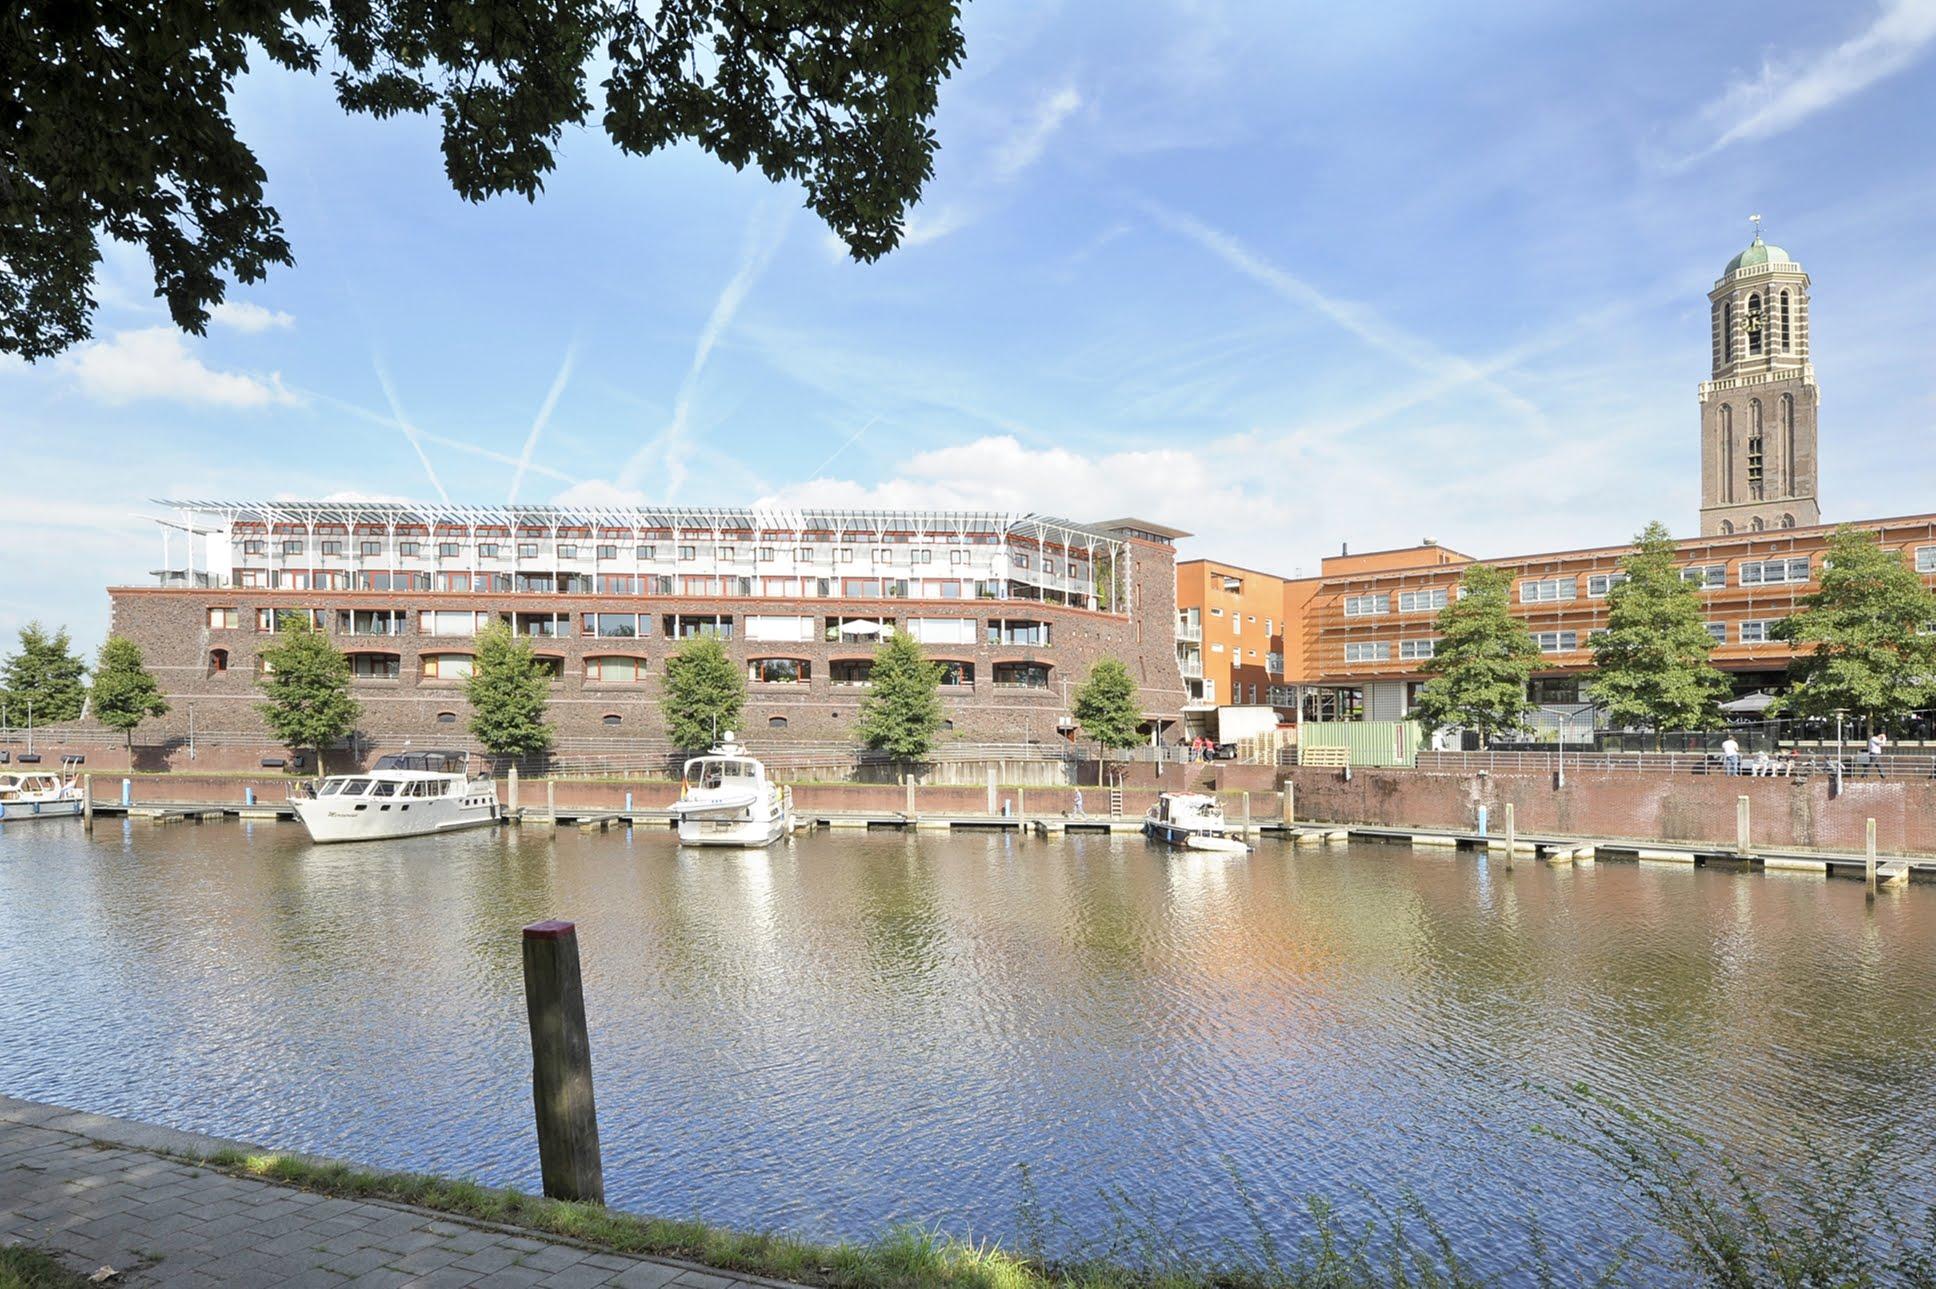 Groot onderhoud Maagjesbolwerk Zwolle - Archetex, Adviseurs en Ingenieurs